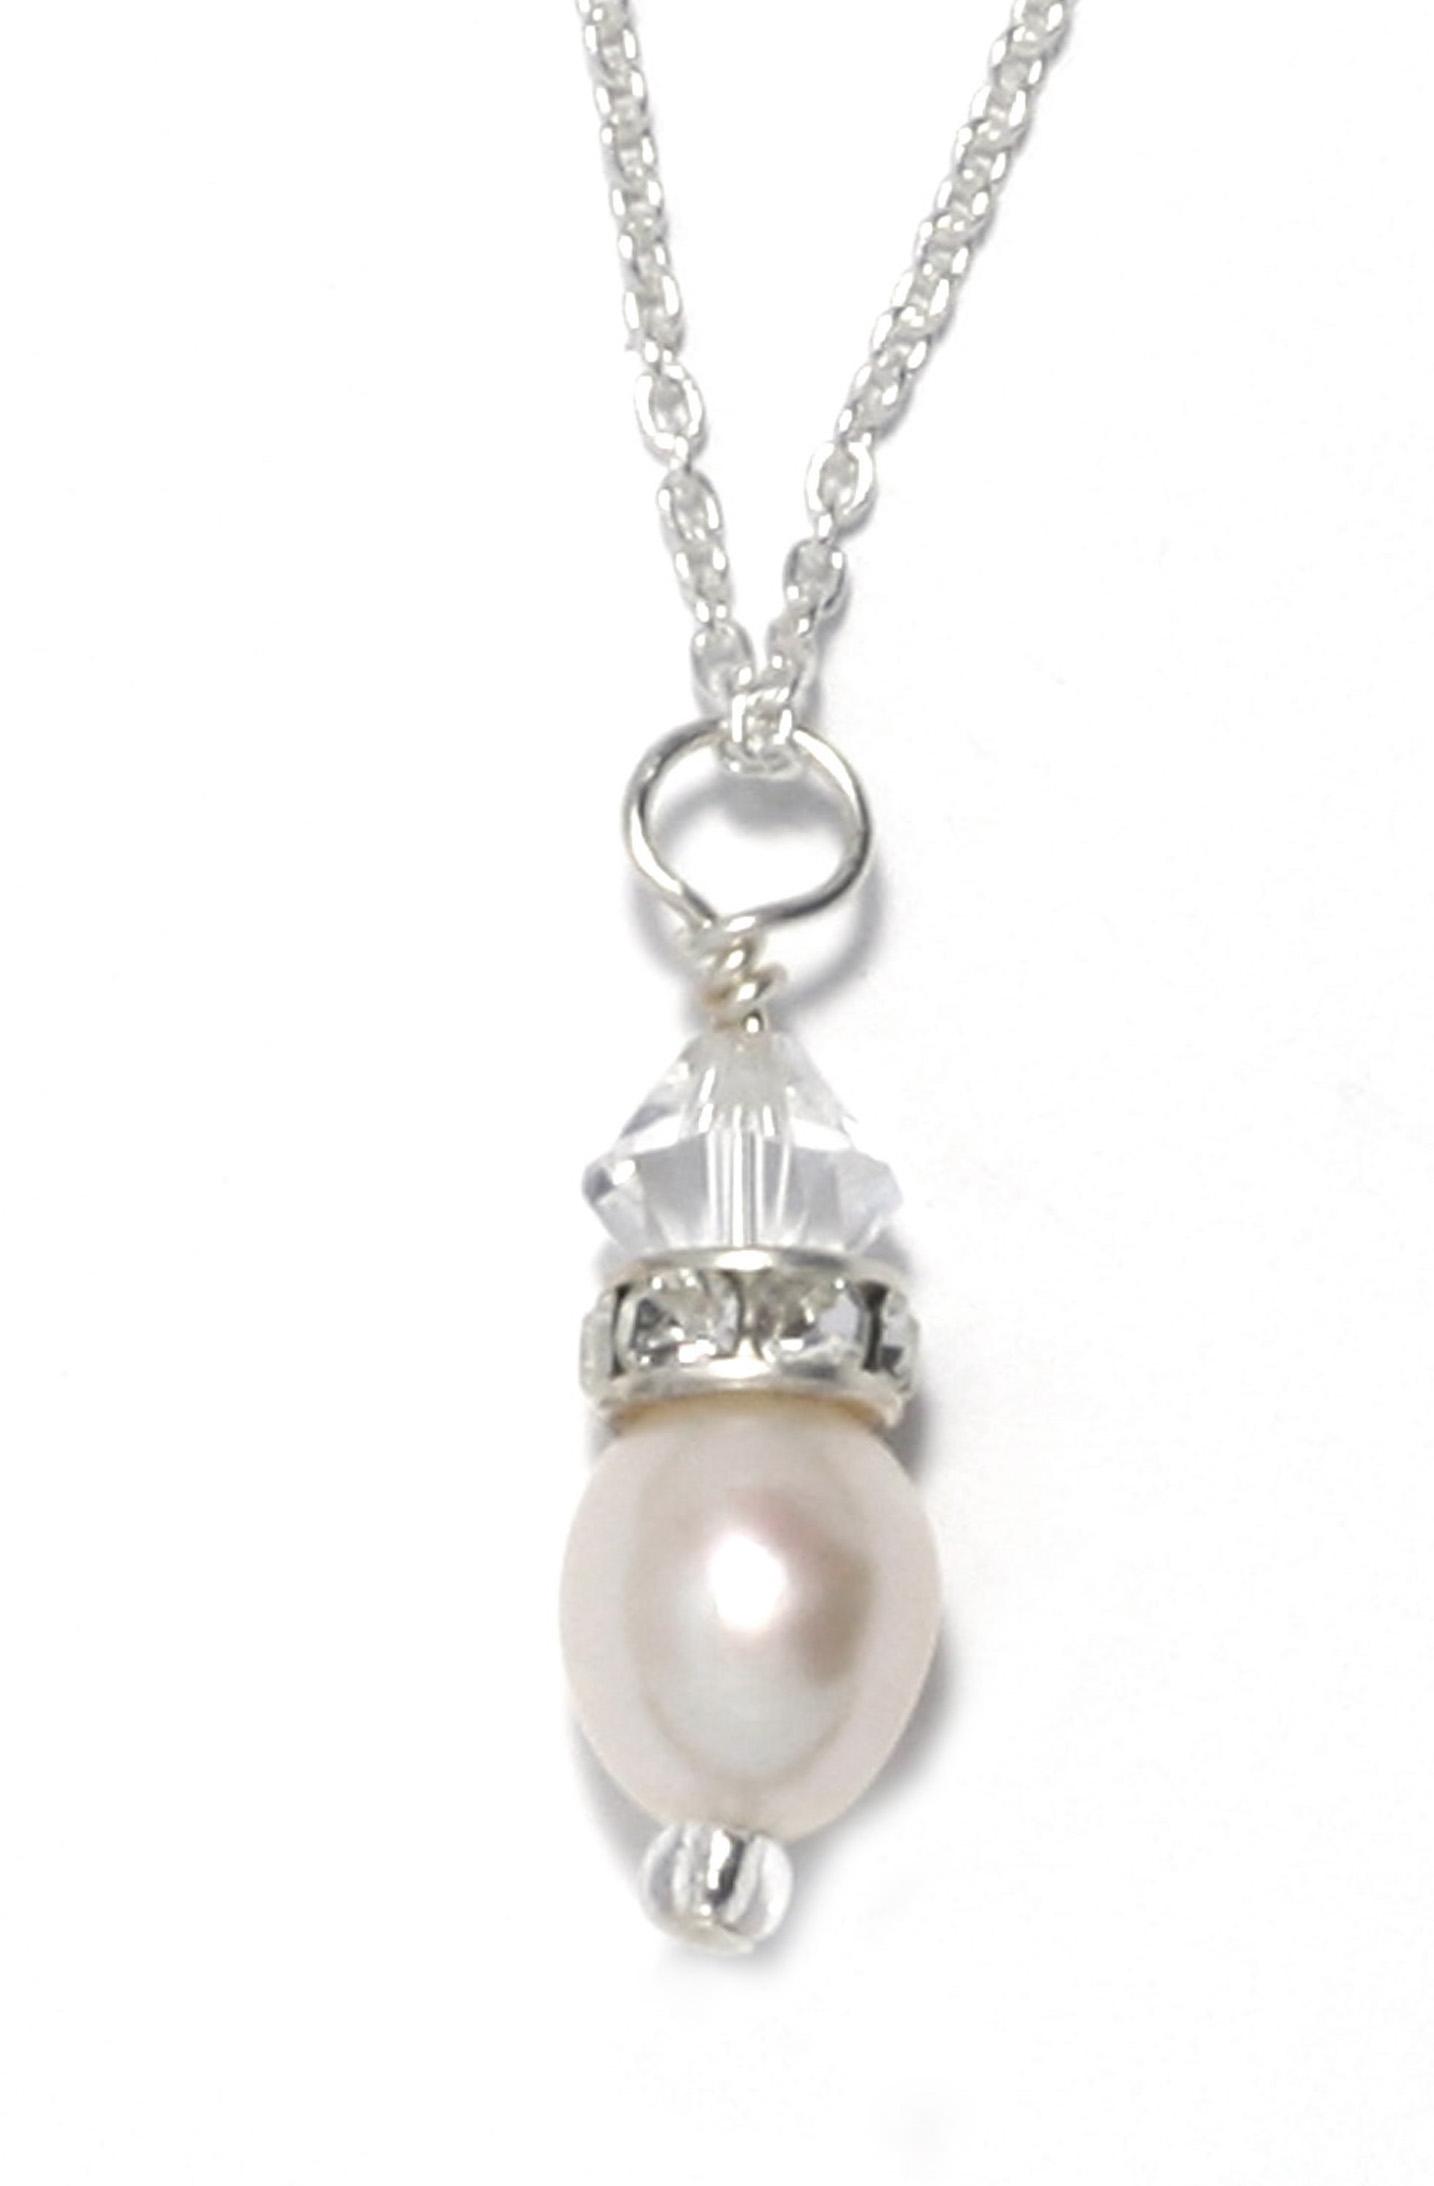 julieannbird.co.uk Allure Purely Pendant Necklace ú27.50.jpg